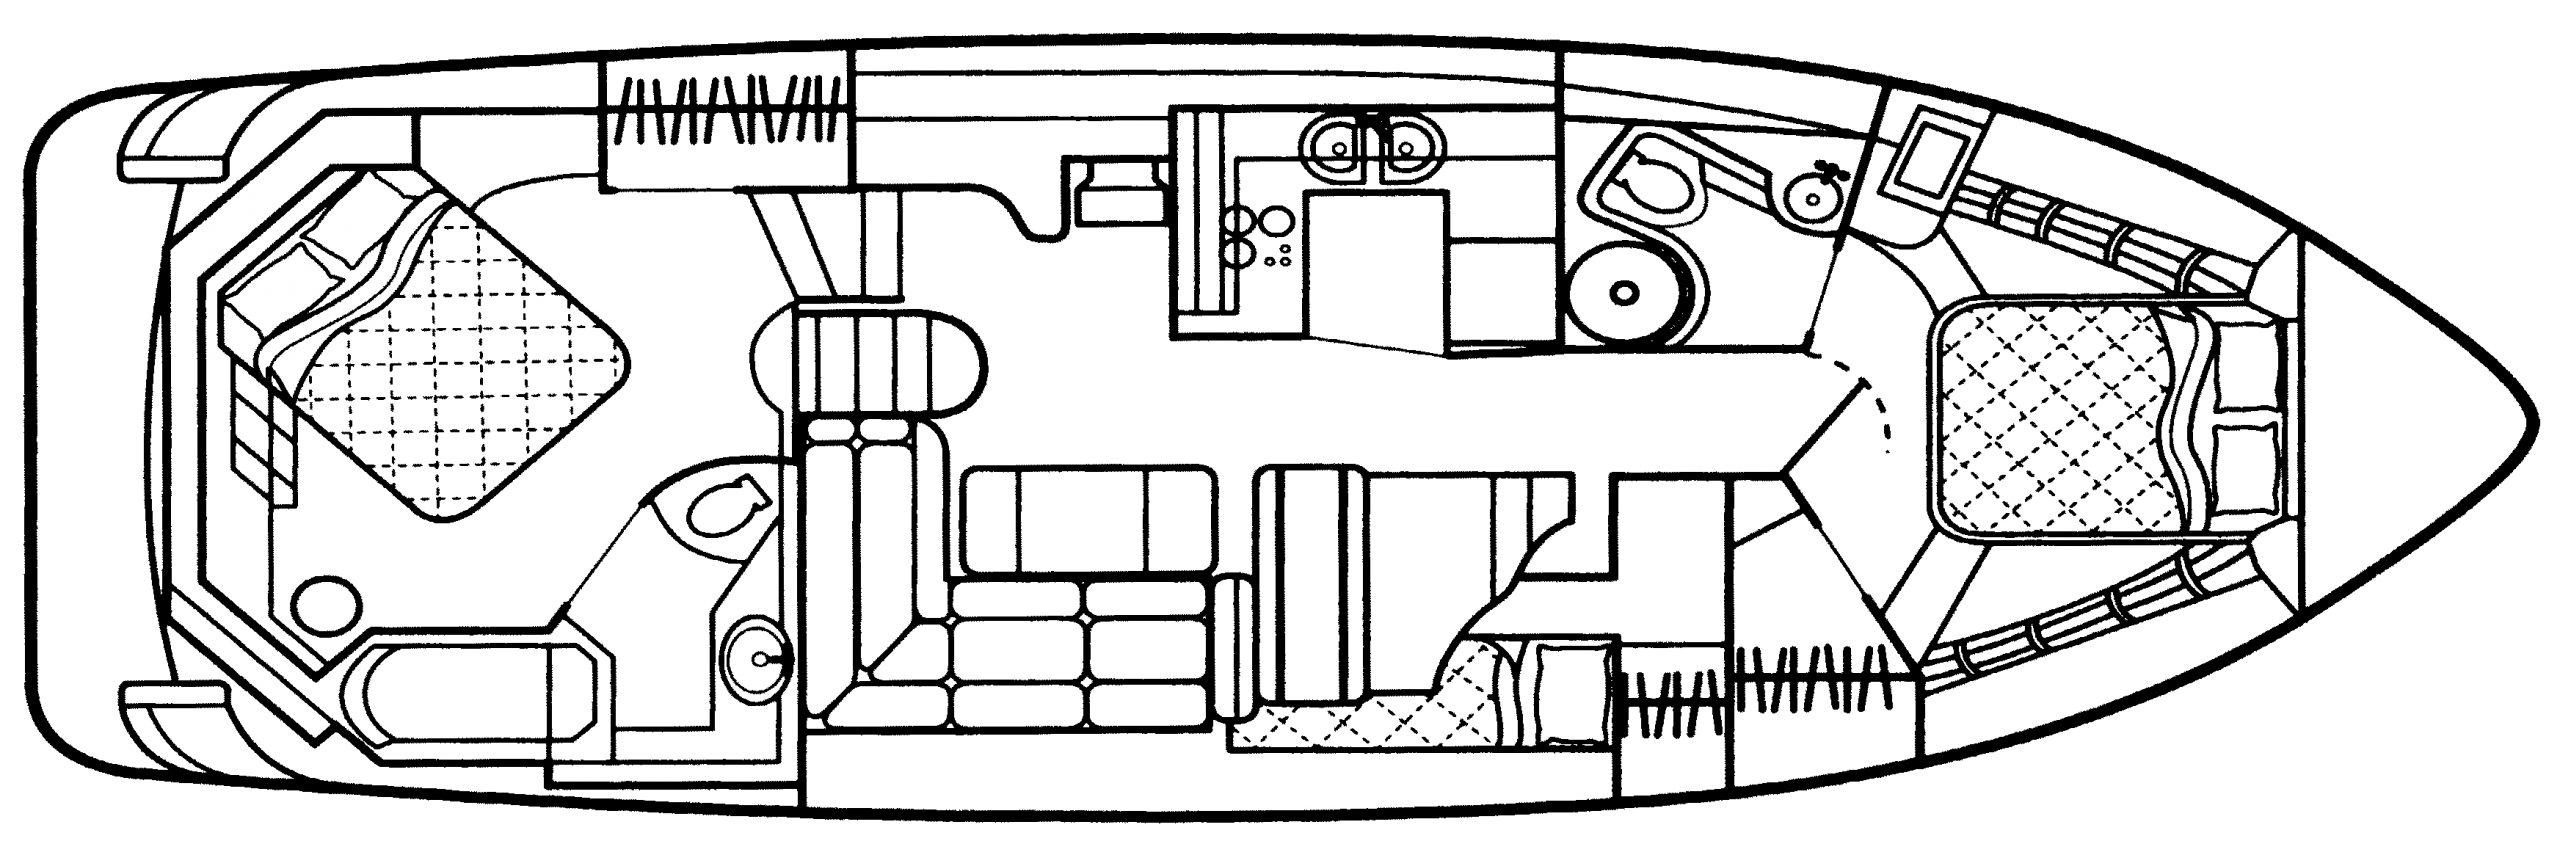 4450 Express Motor Yacht Floor Plan 1